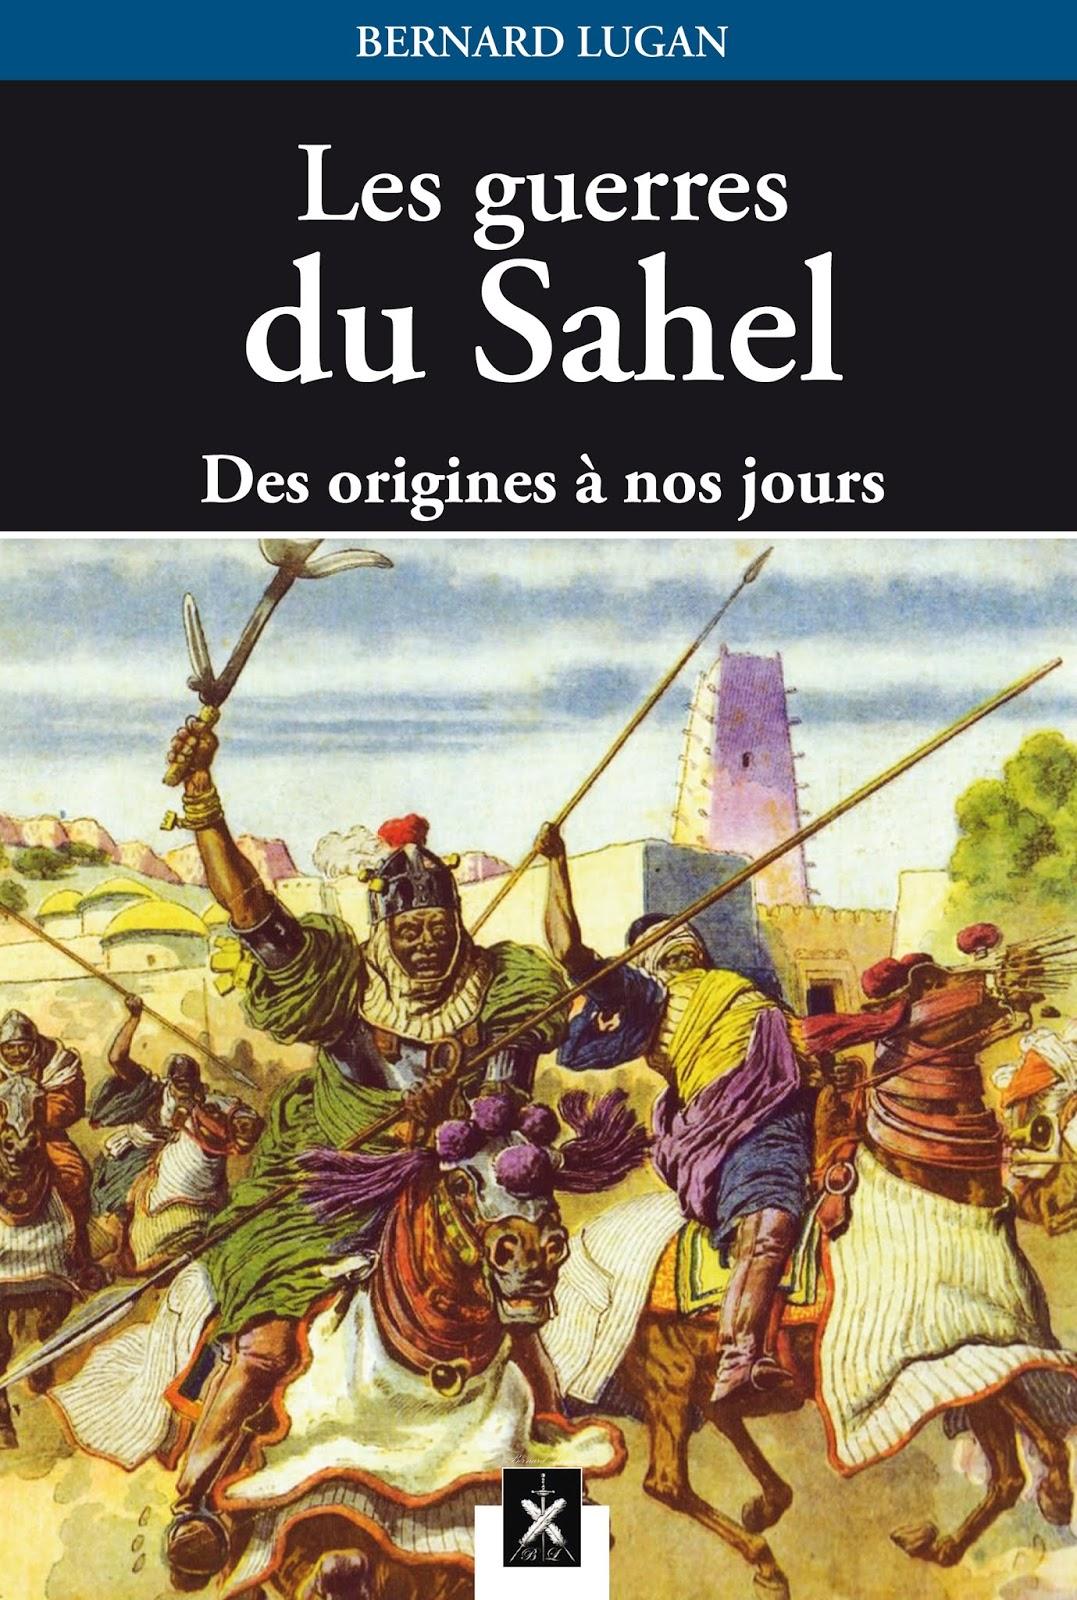 low priced fa376 fee8e Nouveau livre de Bernard Lugan   Les Guerres du Sahel